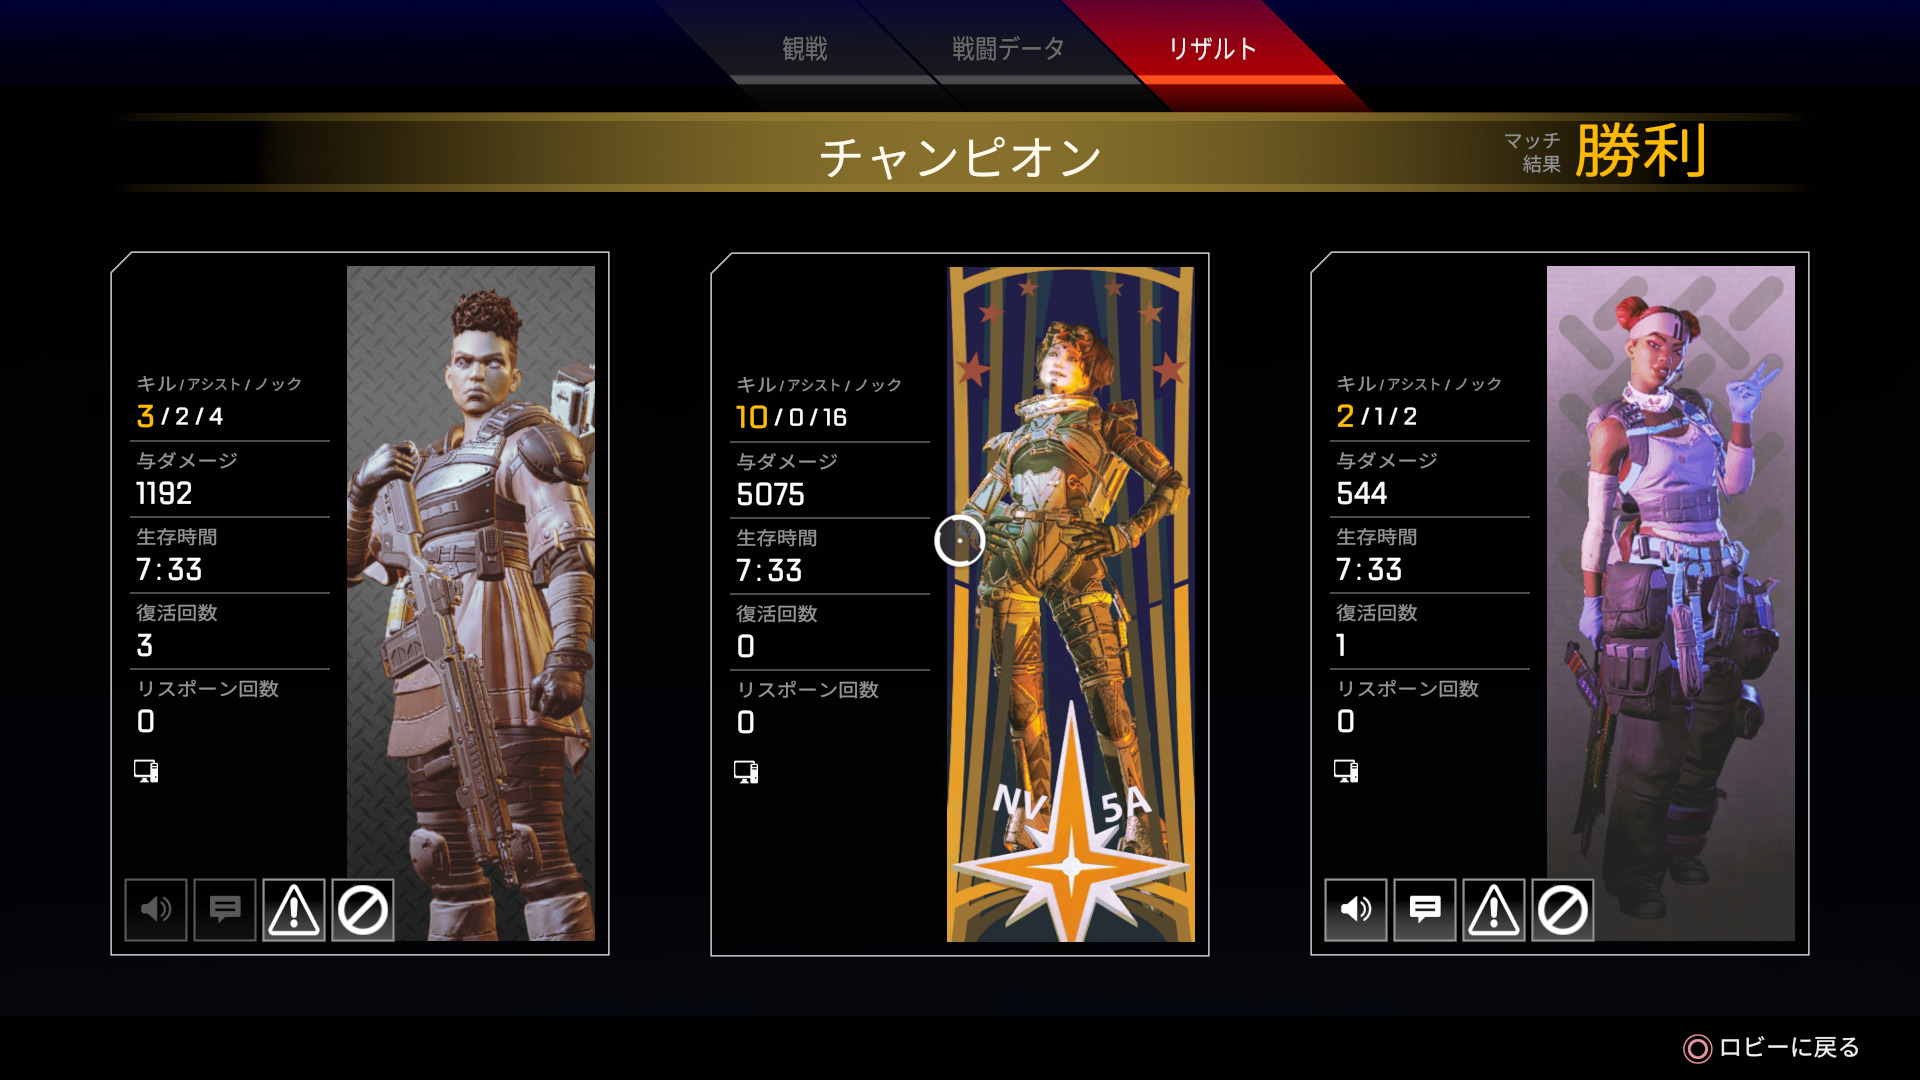 【Apex Legends】アリーナモードはハンマー取れる?【エーペックスレジェンズ】